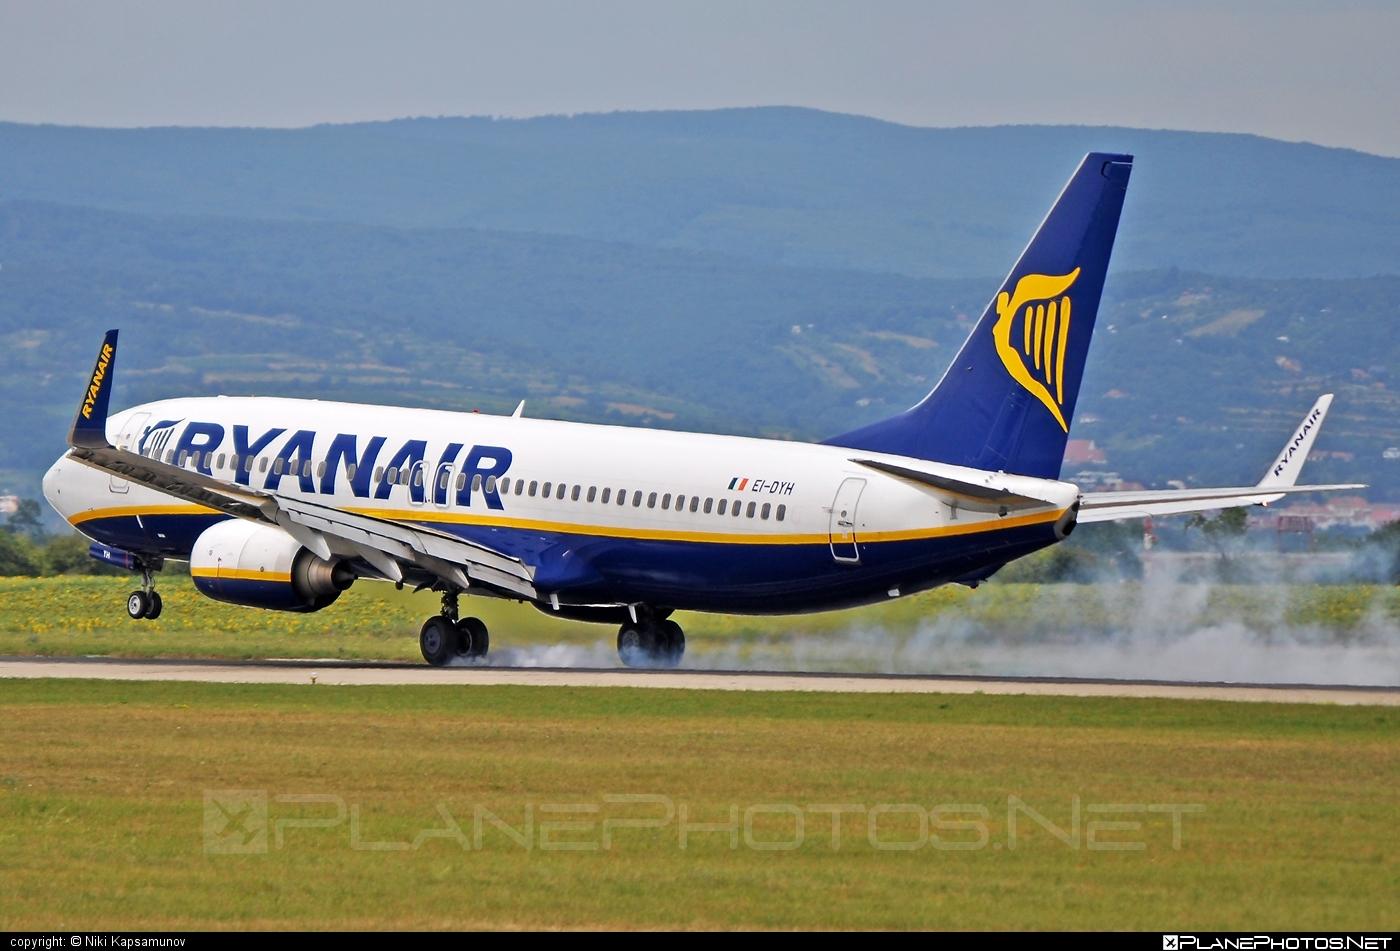 Boeing 737-800 - EI-DYH operated by Ryanair #b737 #b737nextgen #b737ng #boeing #boeing737 #ryanair